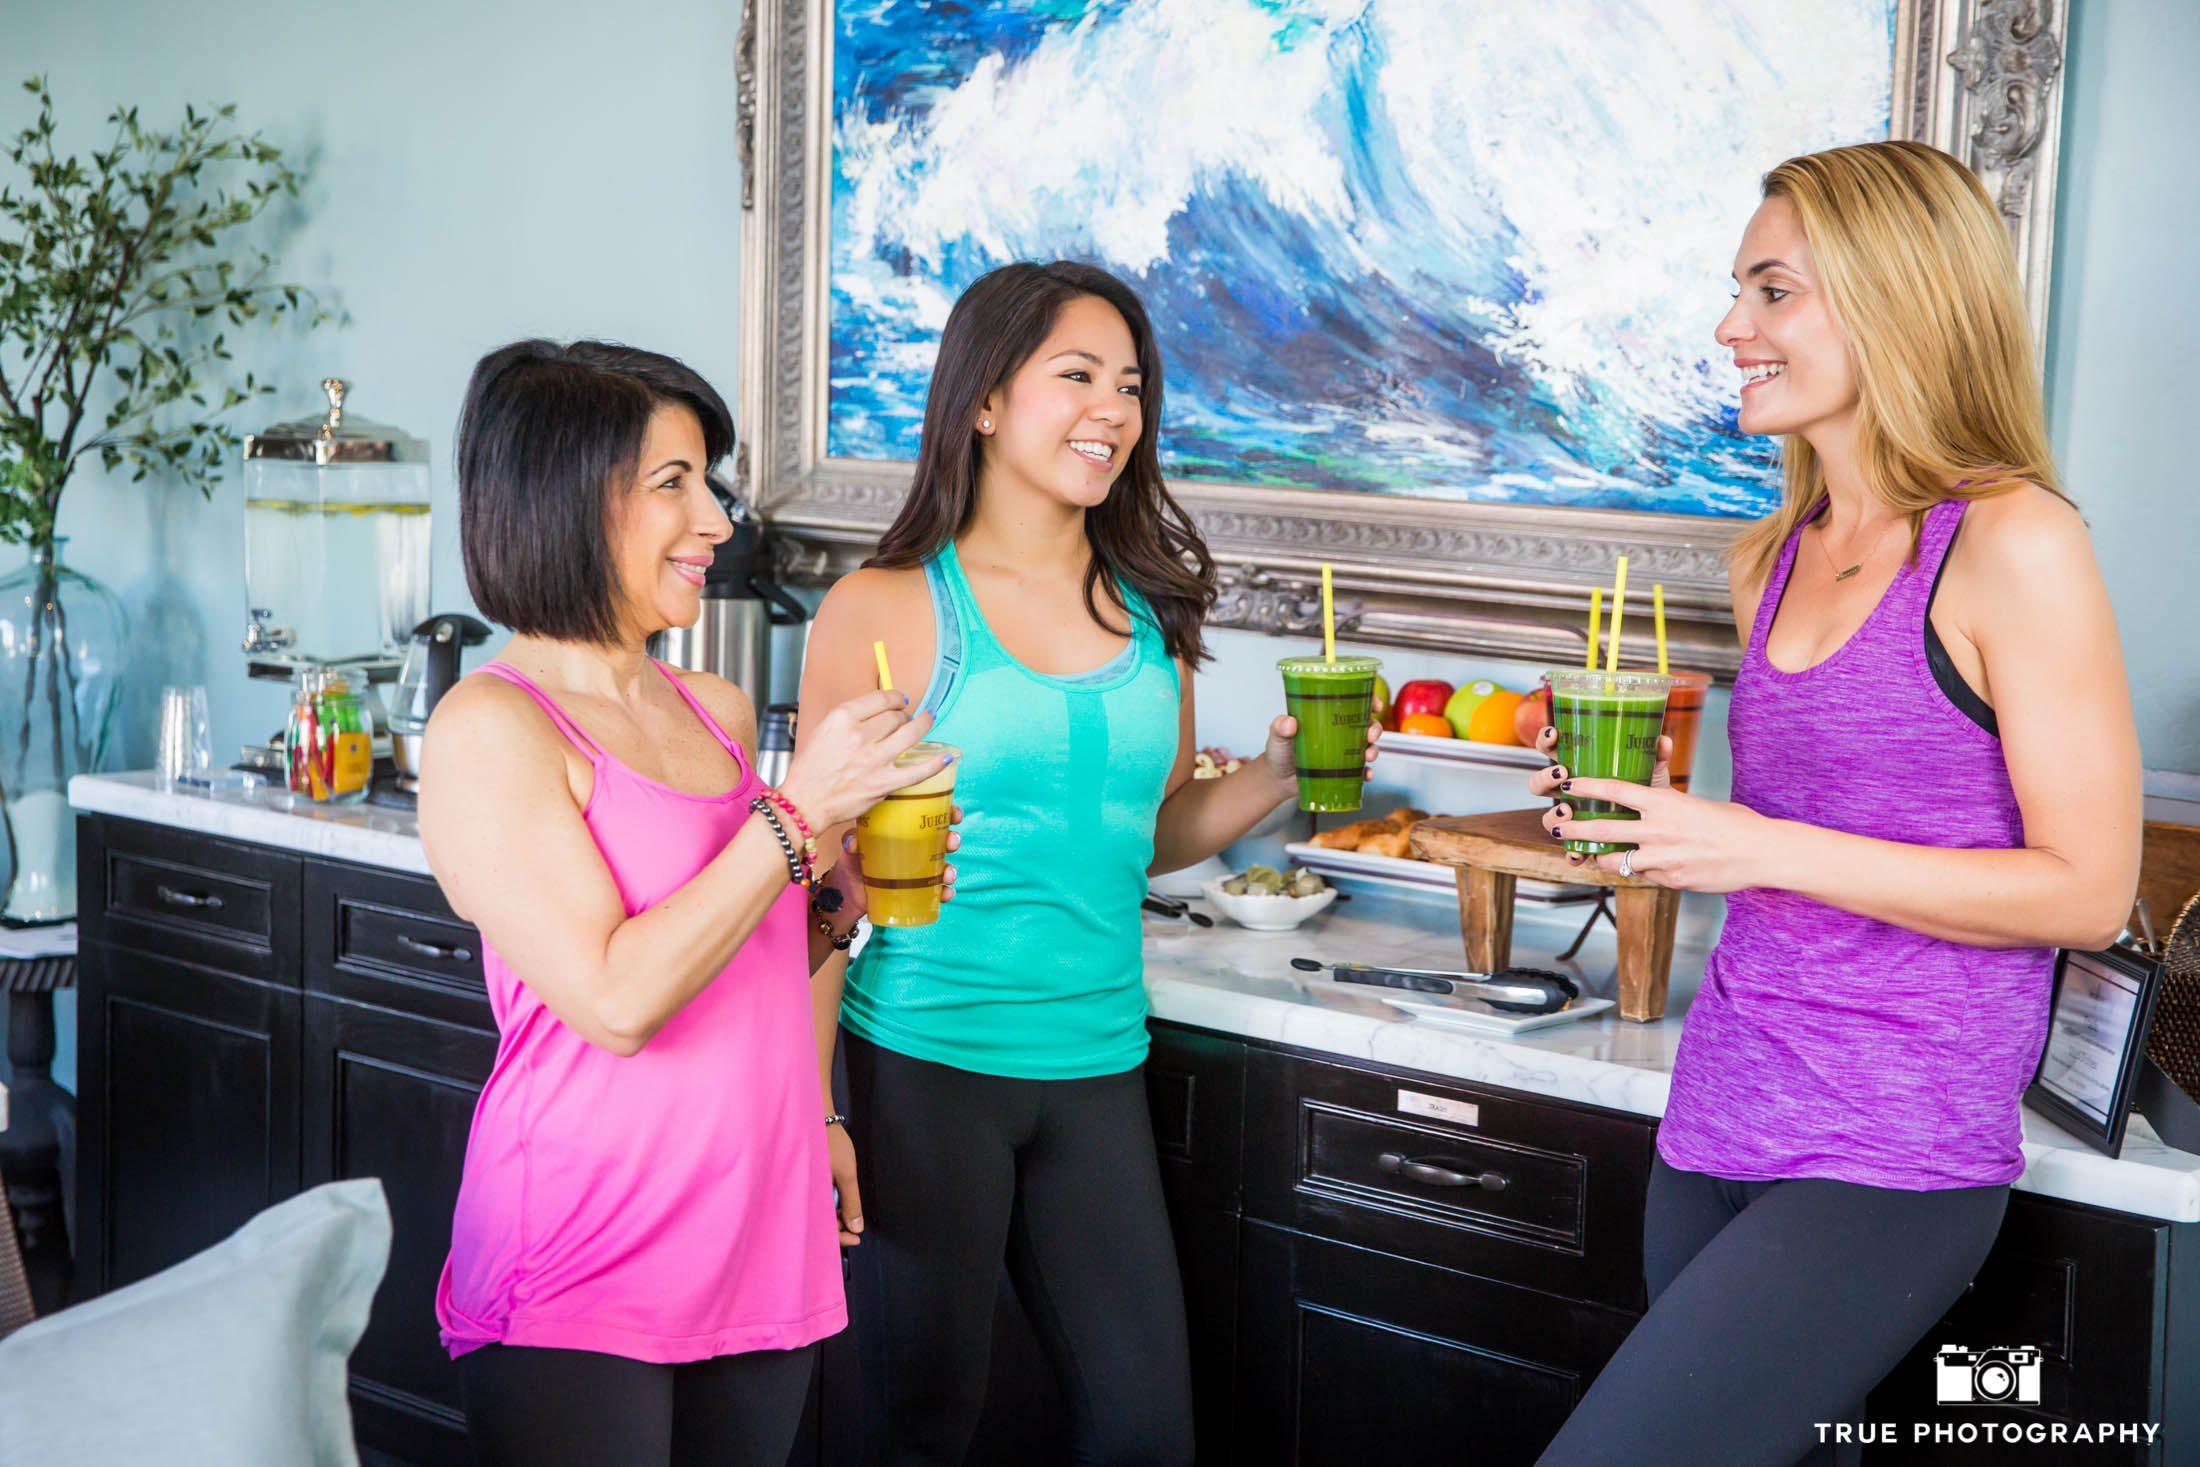 Healthy lifestyle photo shoot